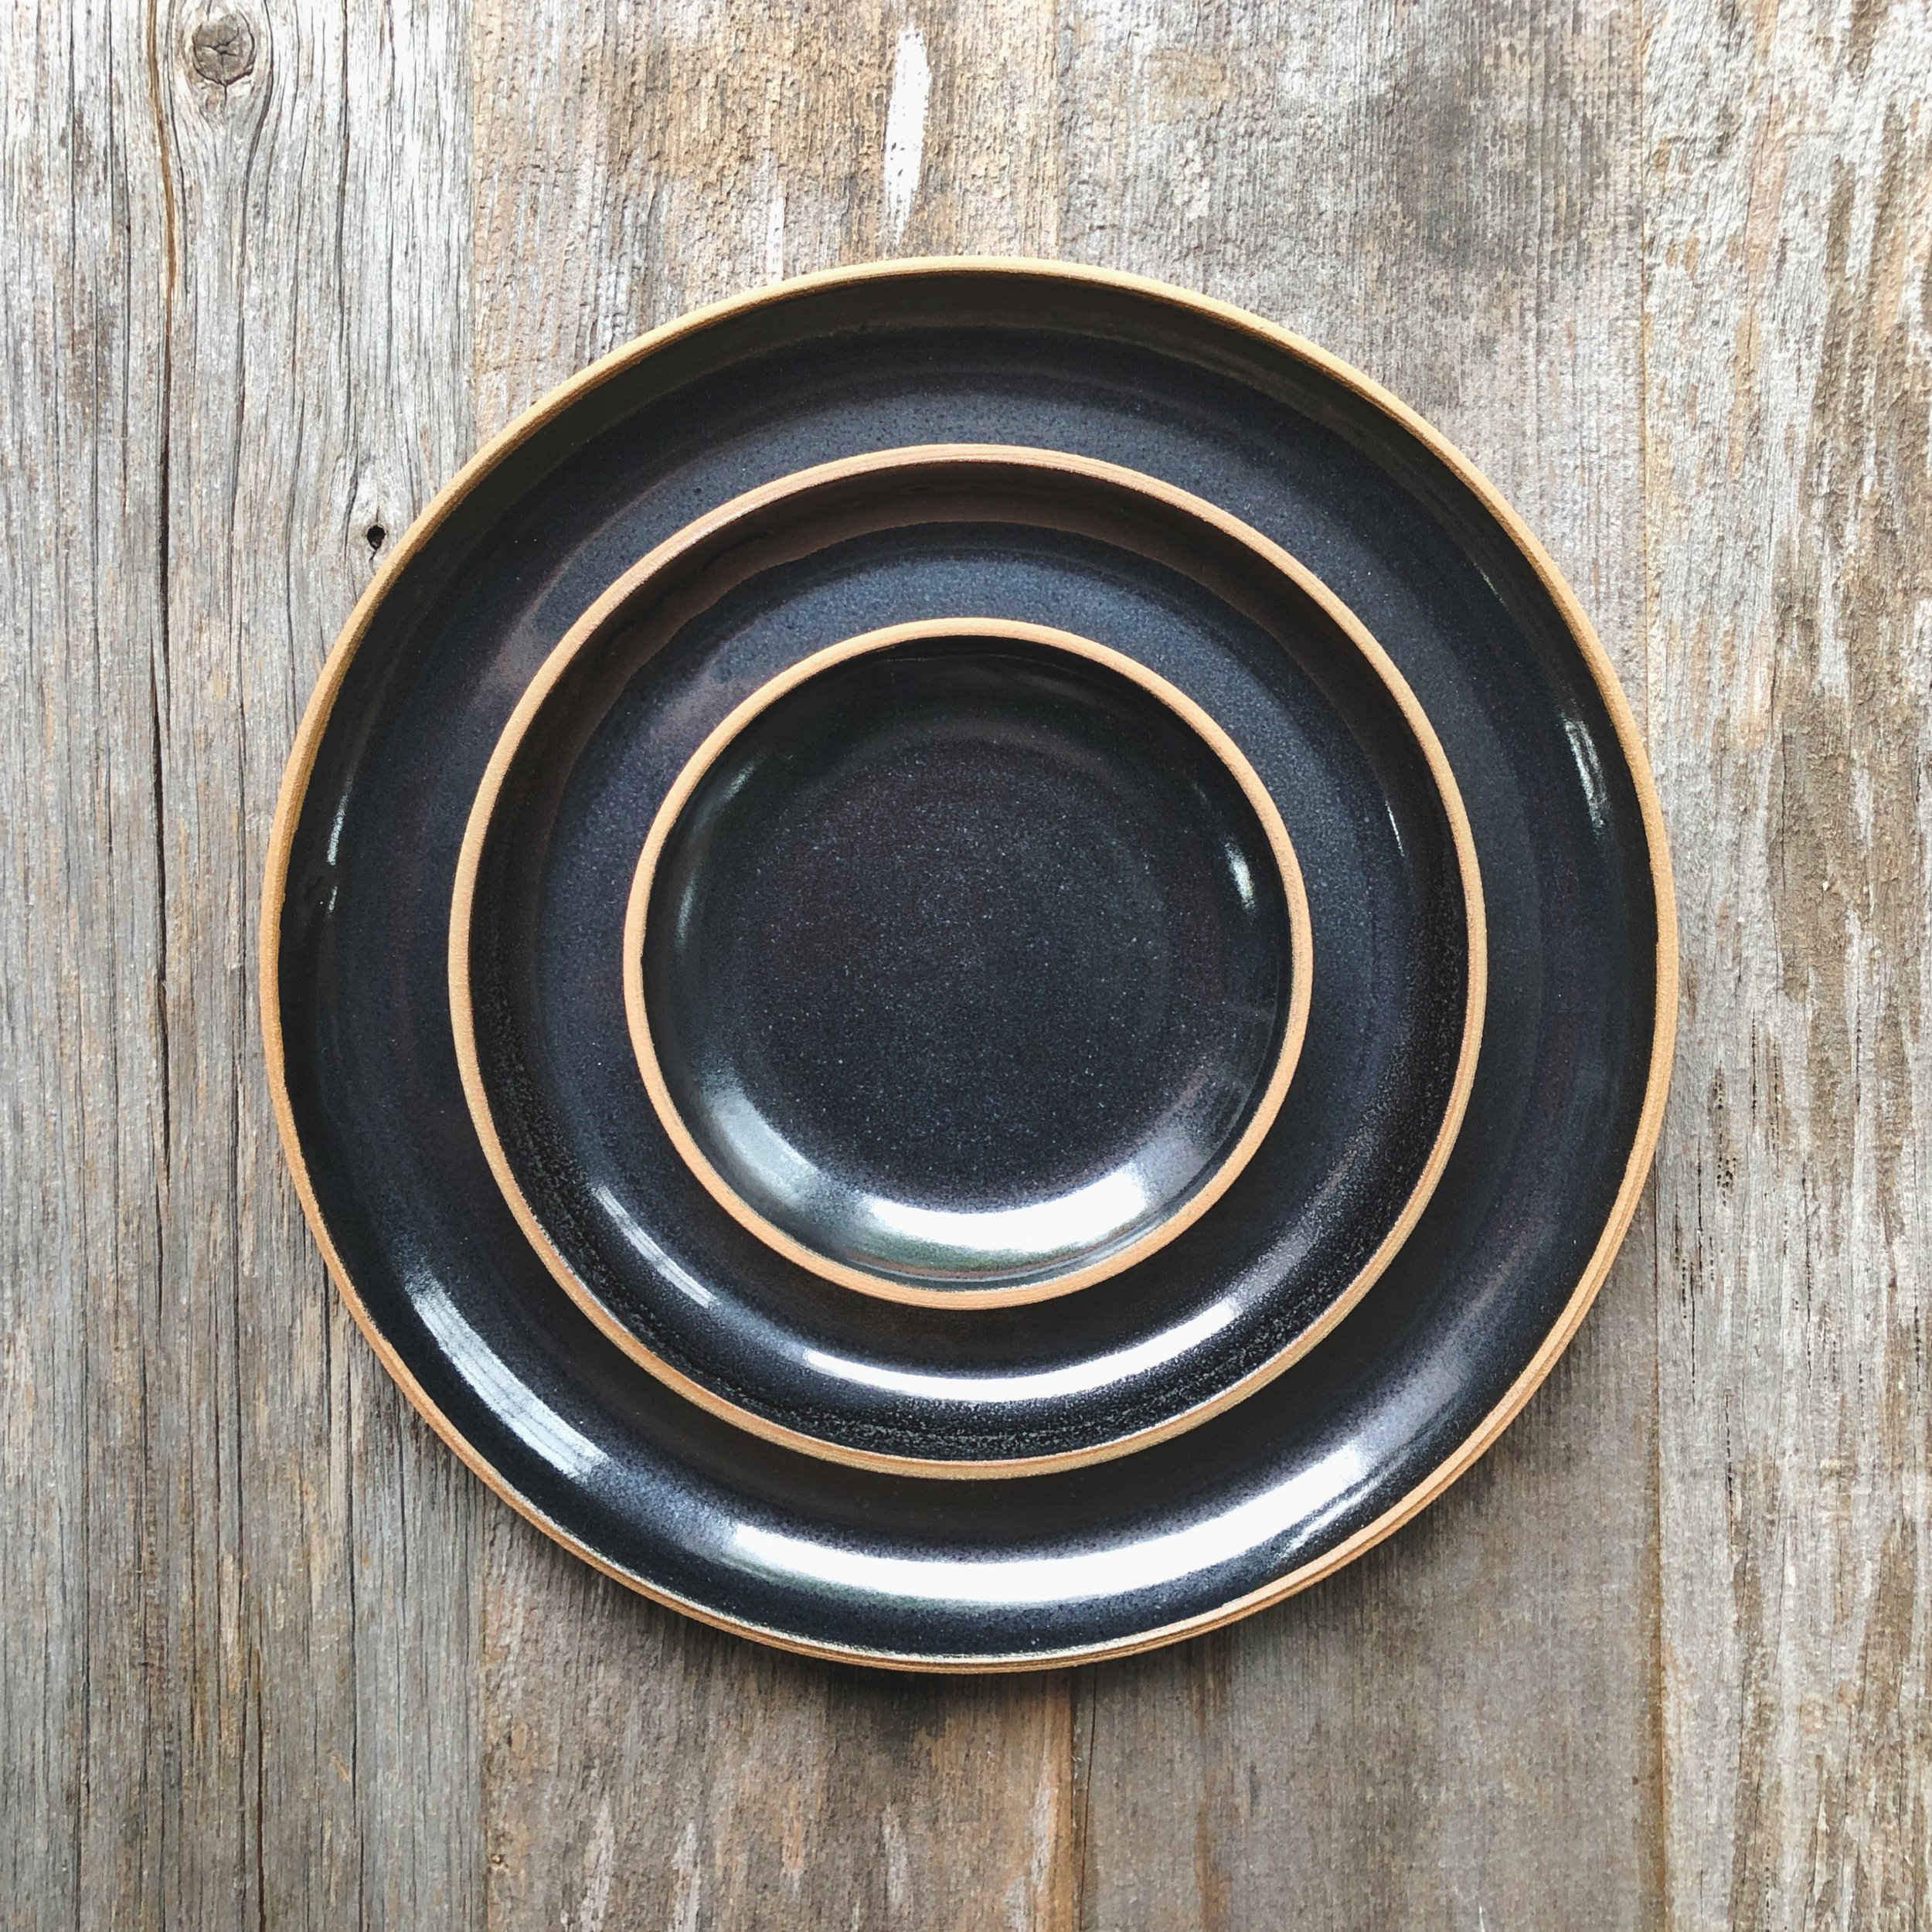 Plates_Dinner_Salad_Side.JPG